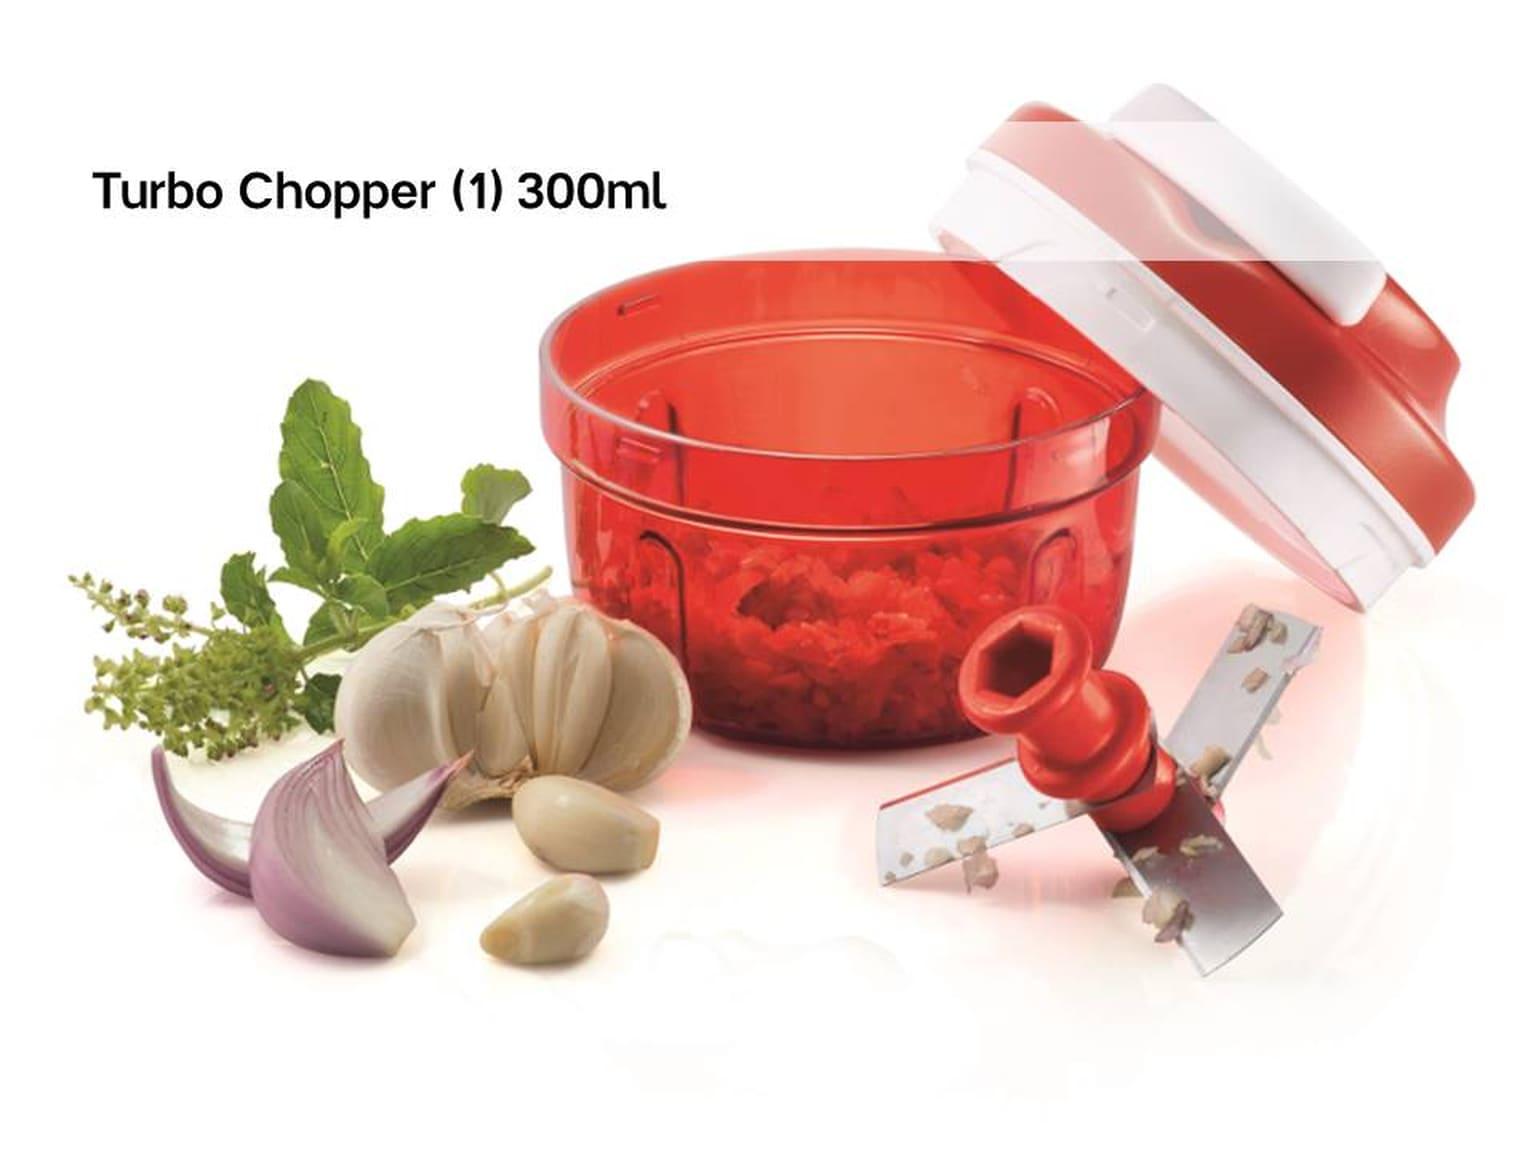 Turbo Chopper (1) 300ml